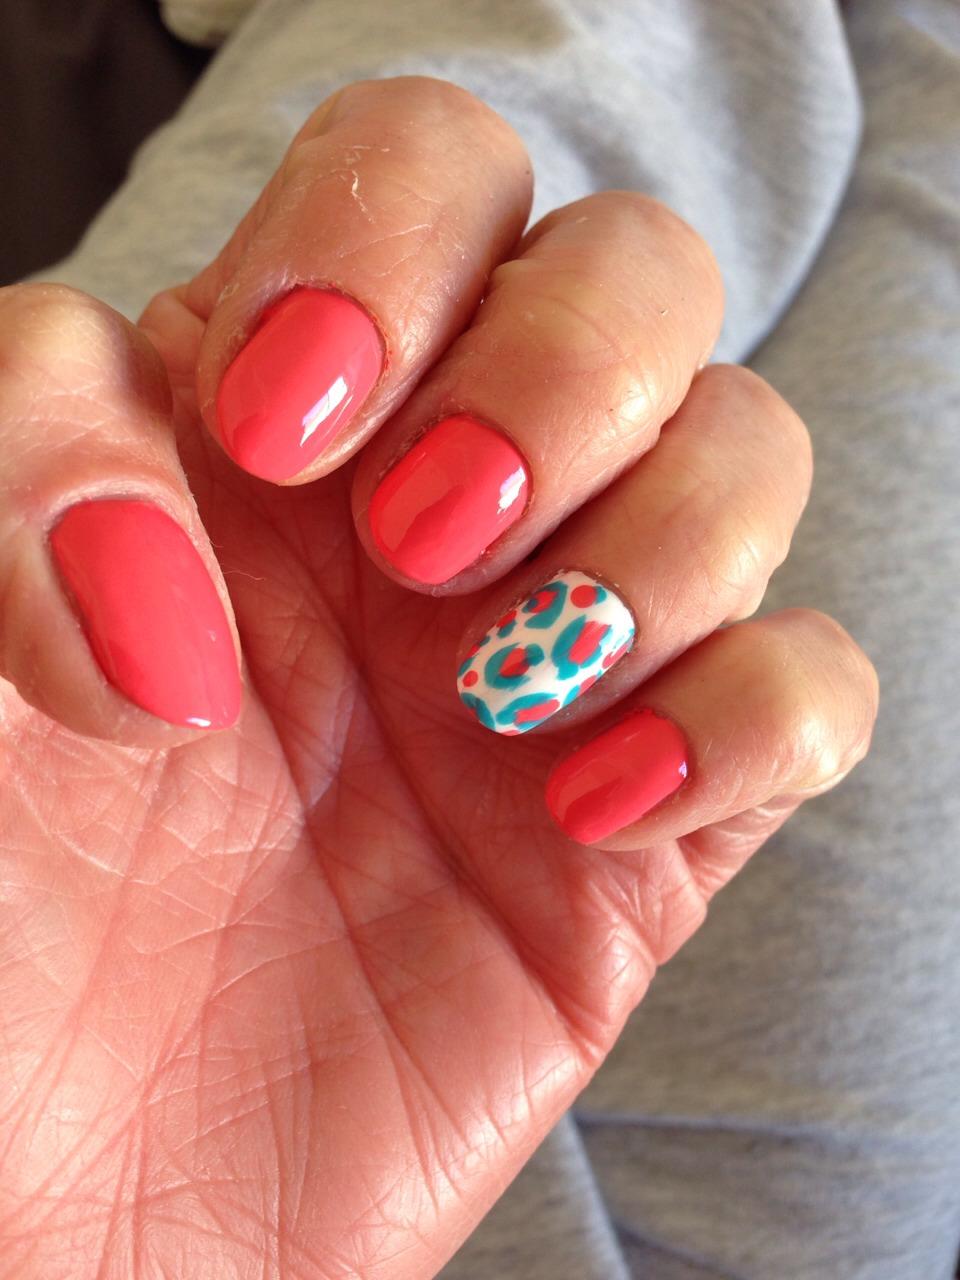 Great Spring Nail Polish Idea!